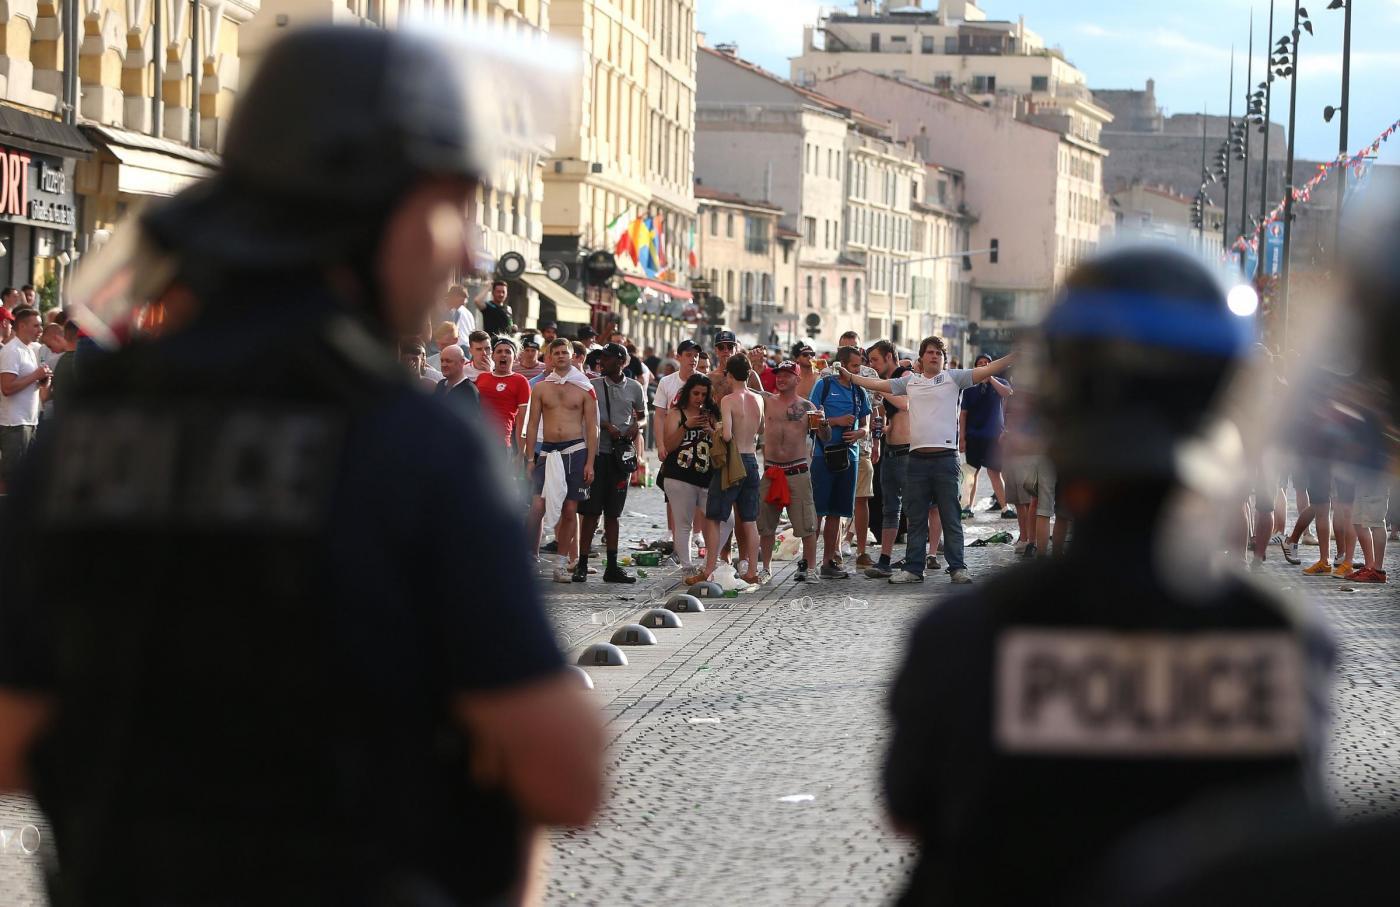 Euro 2016 tensioni tra tifosi inglesi e polizia a Marsiglia